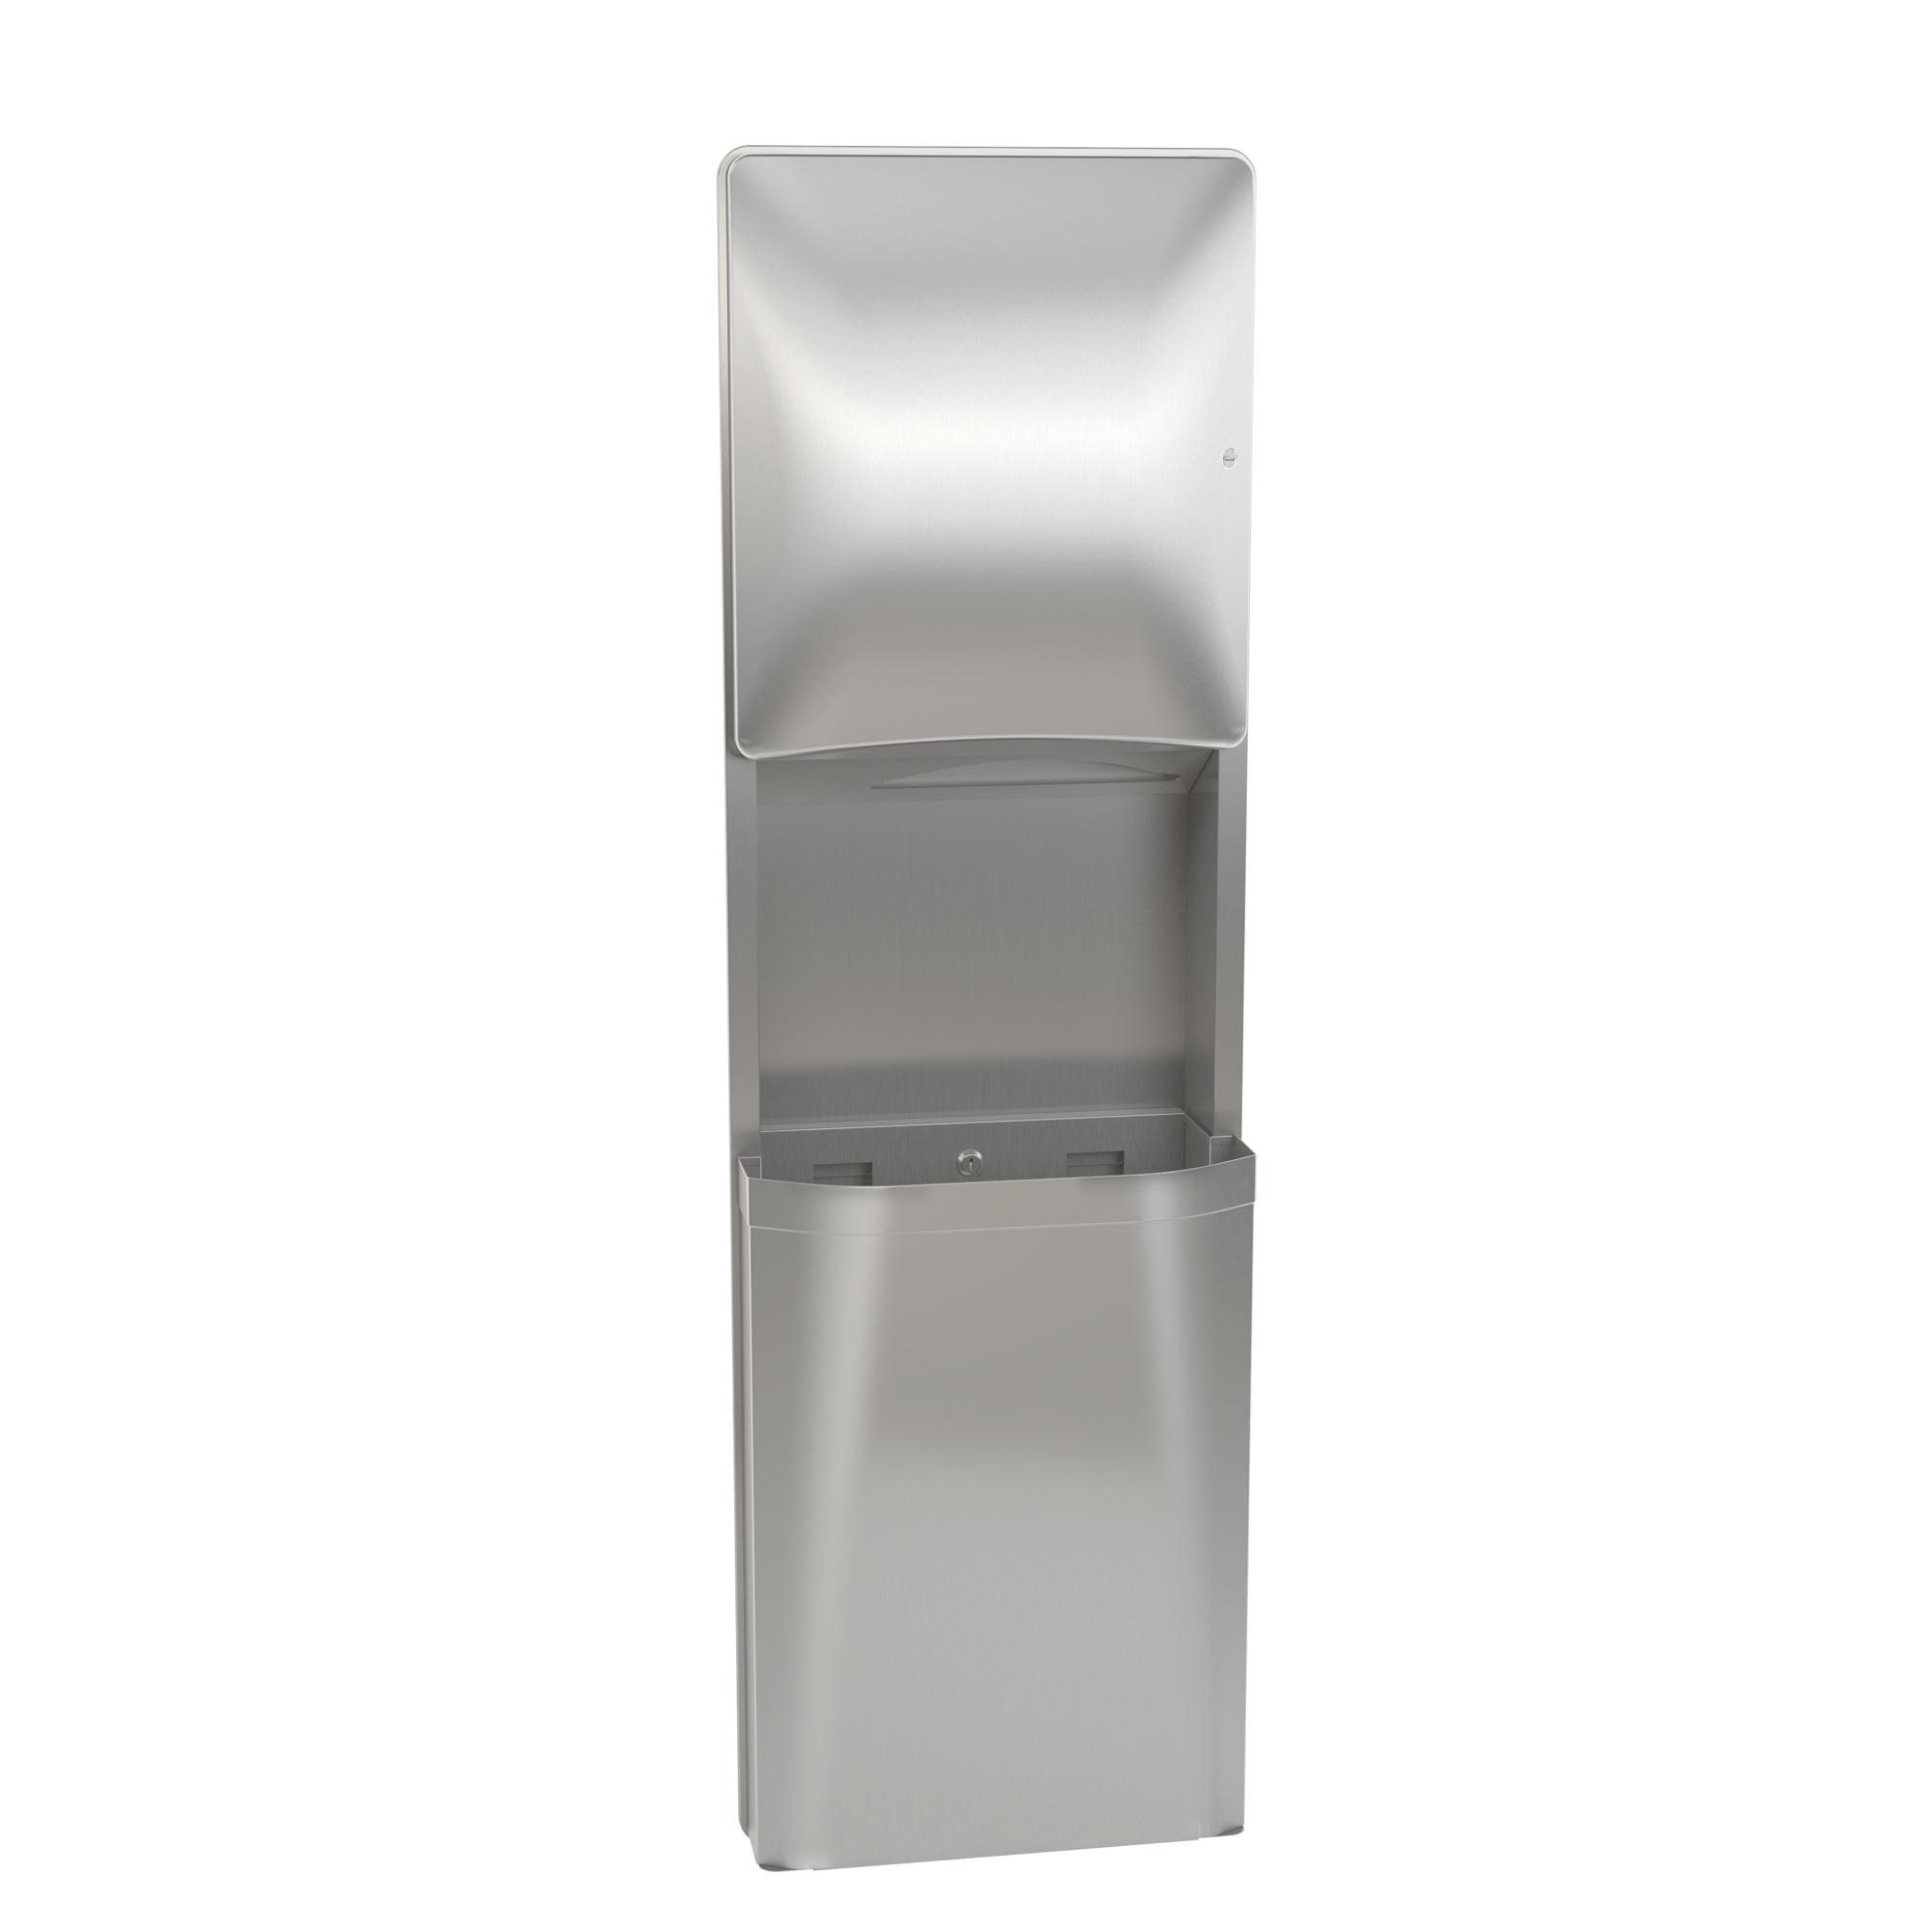 Bradley 2A05-10 Semi-Recessed Folded Towel Dispenser & 12 gal. Waste Receptacle